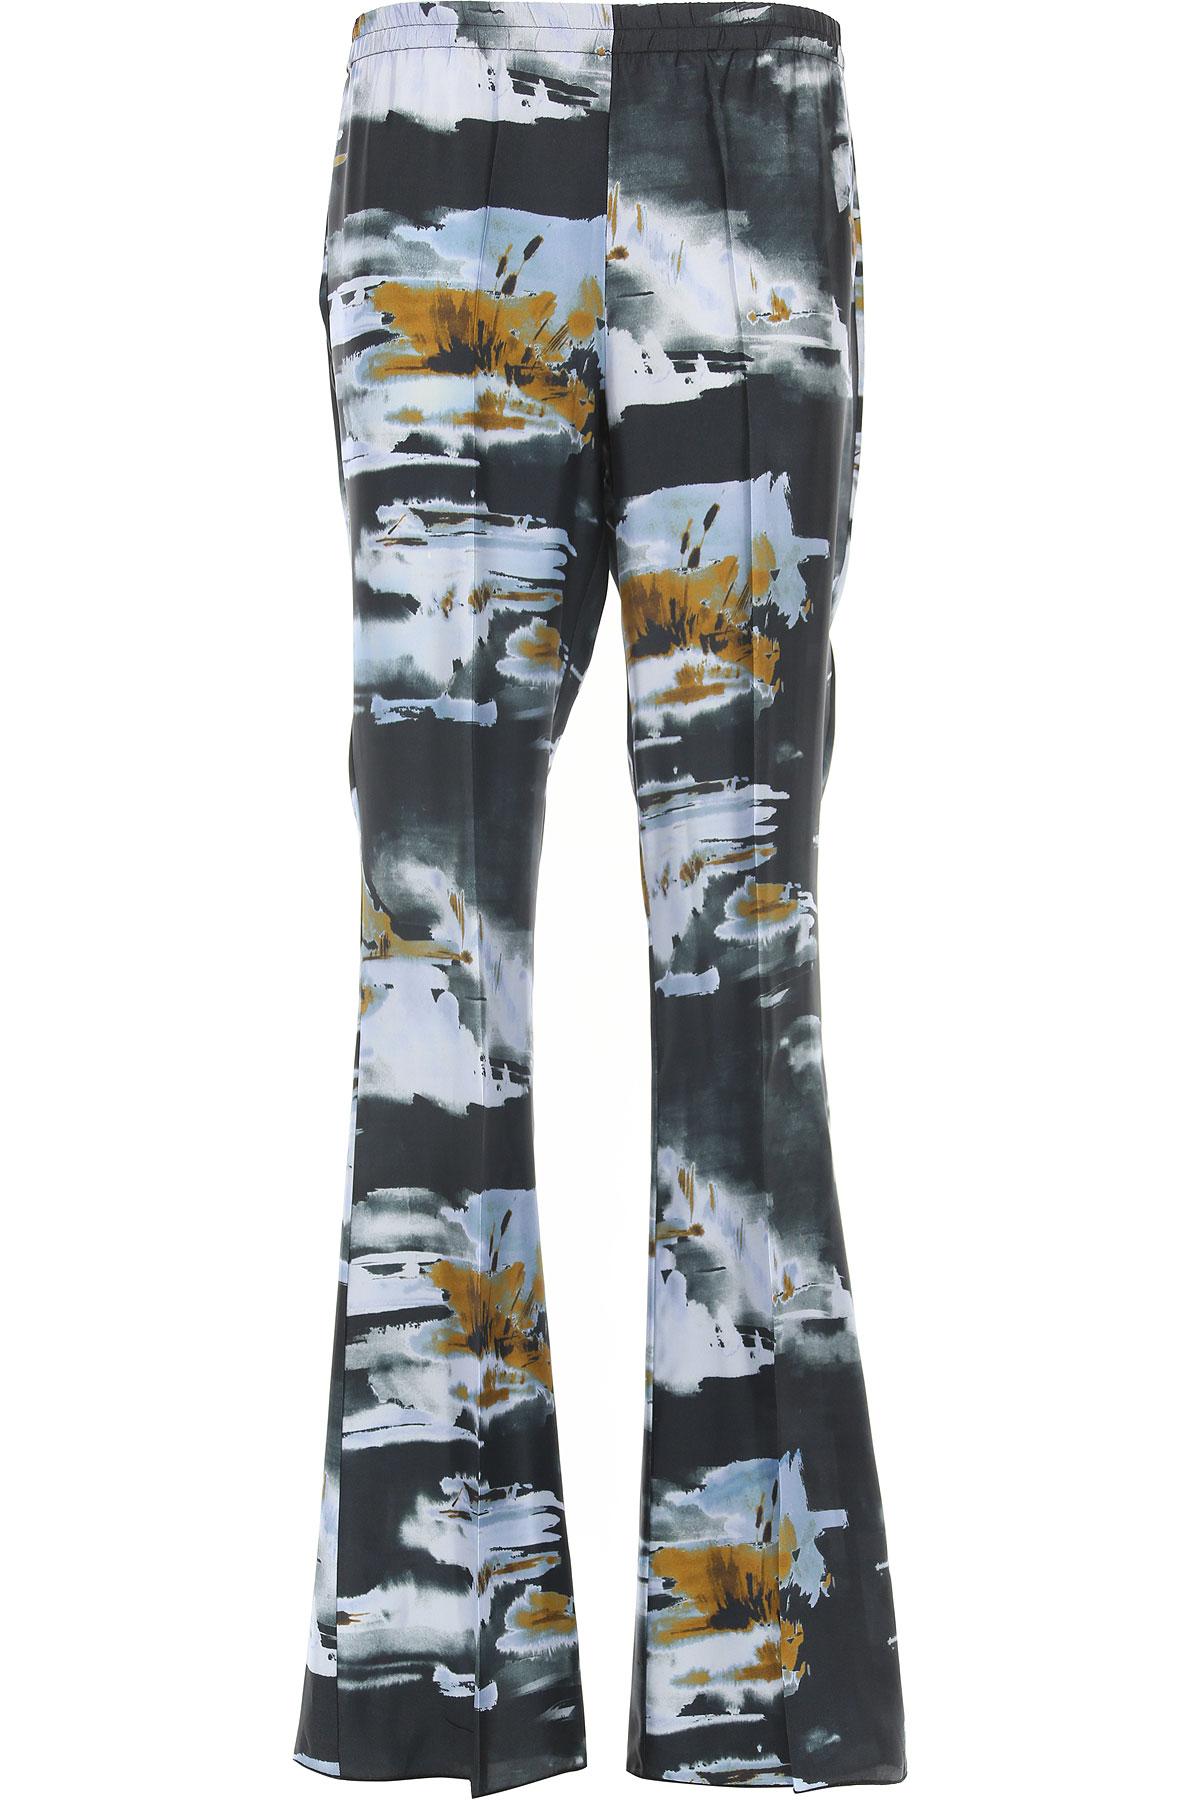 Image of Jucca Pants for Women, Black, viscosa, 2017, 26 28